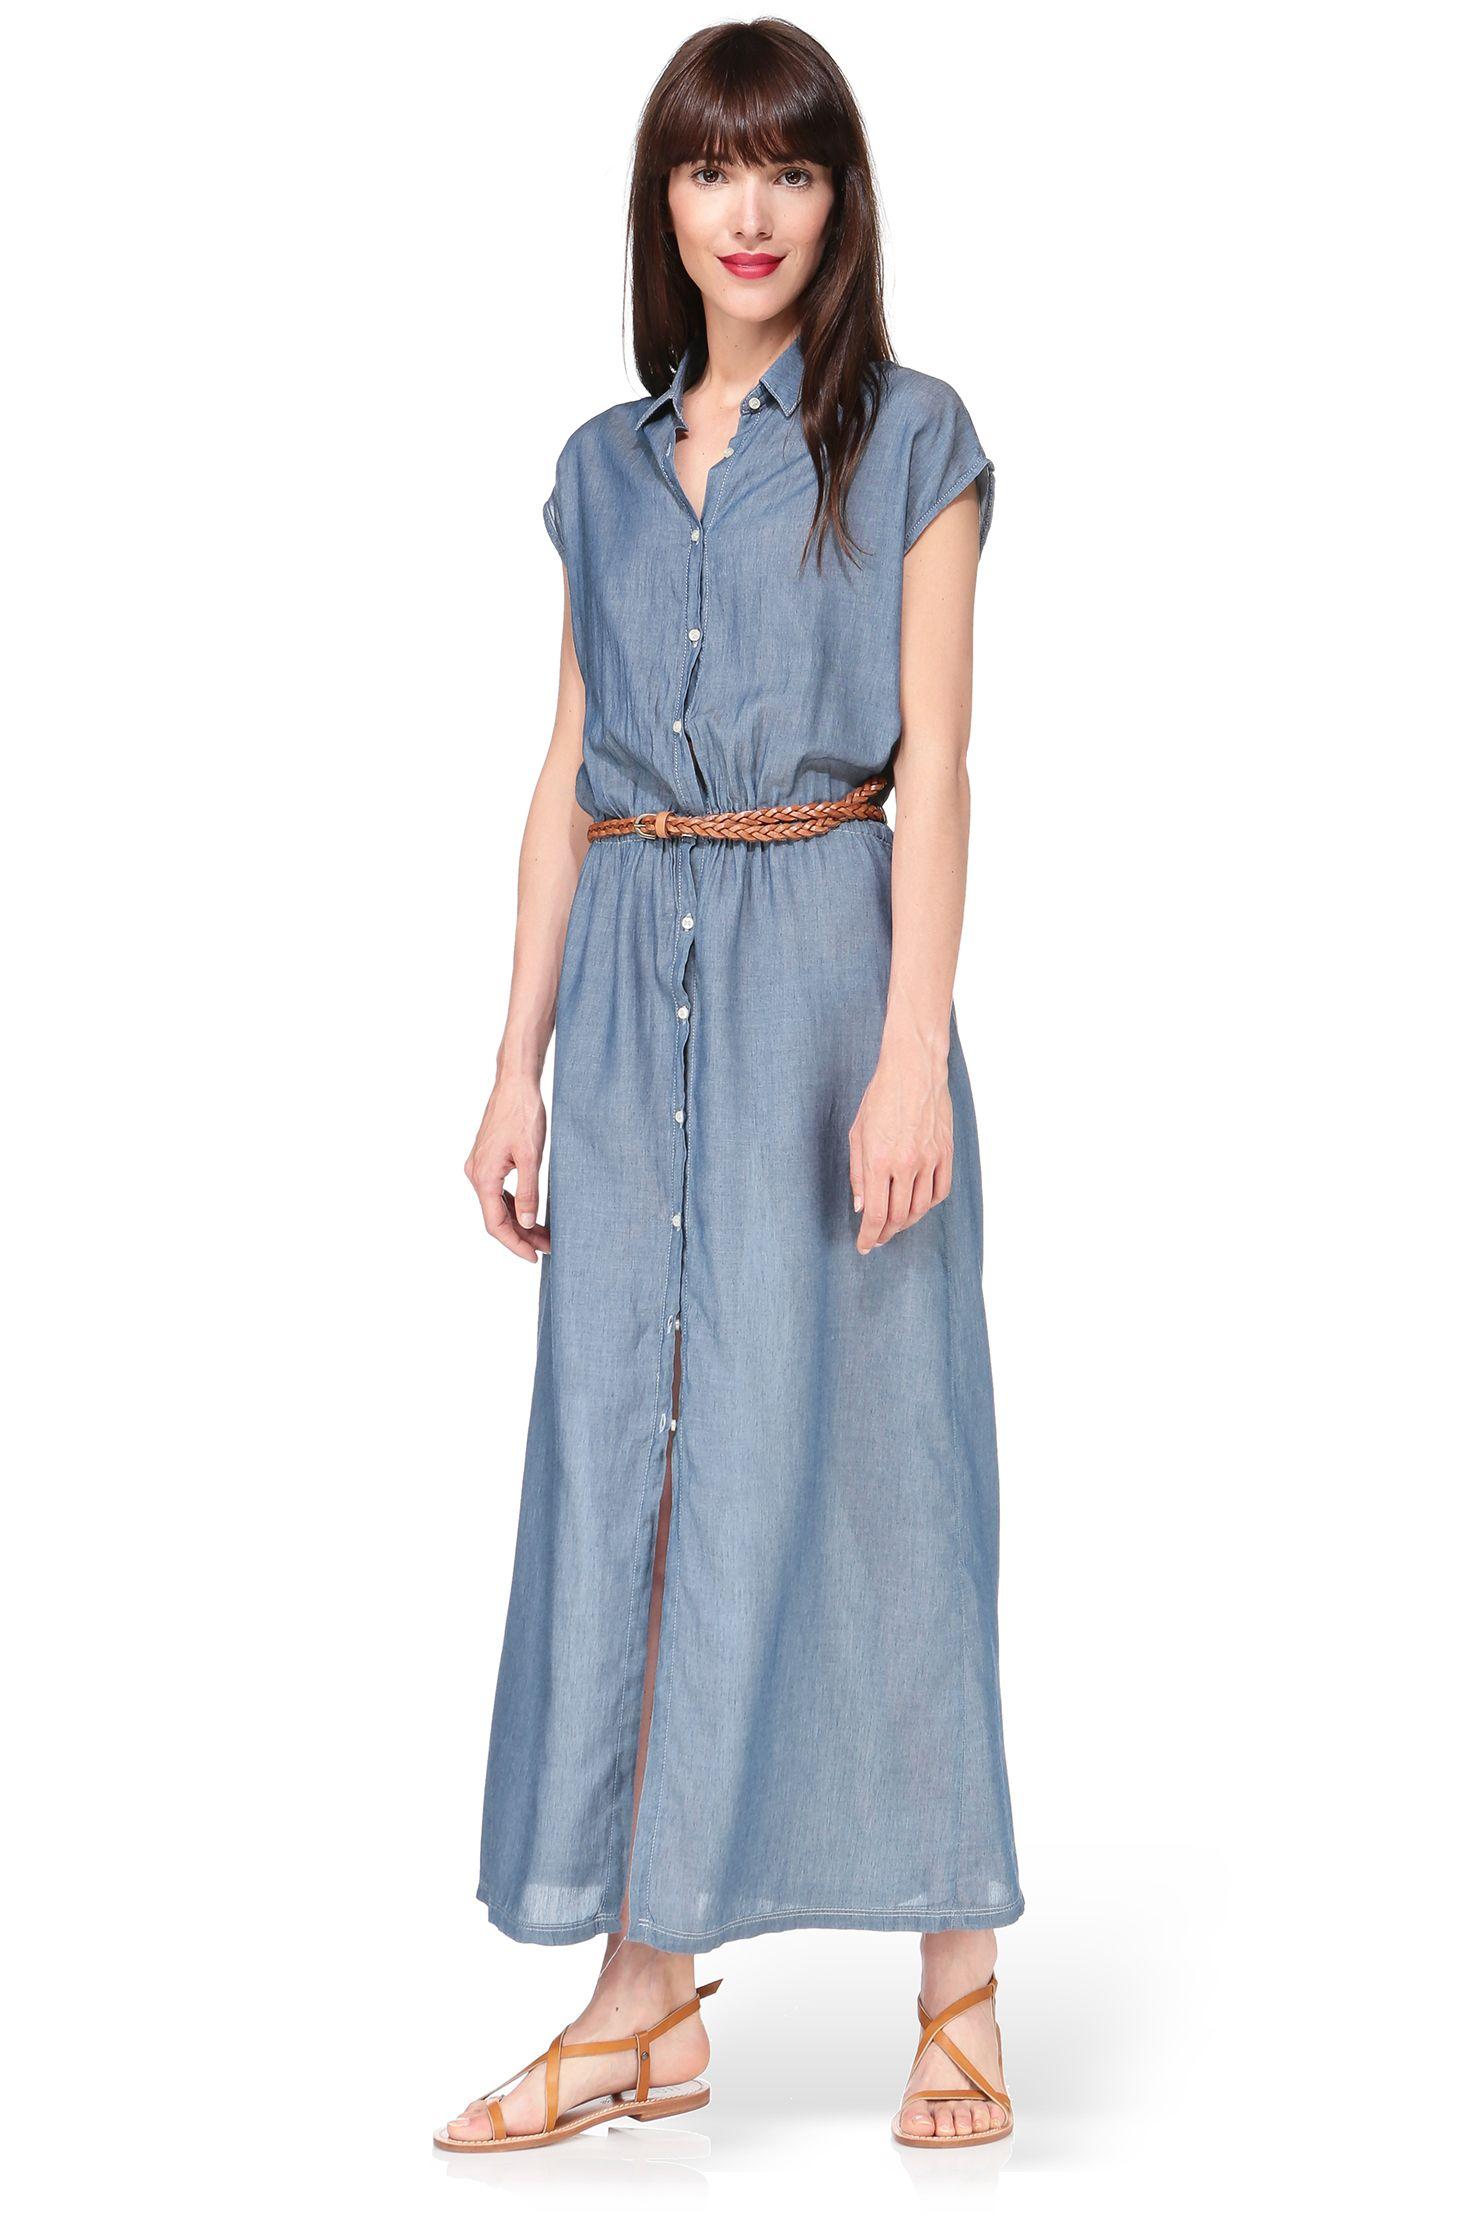 Jean robe longue